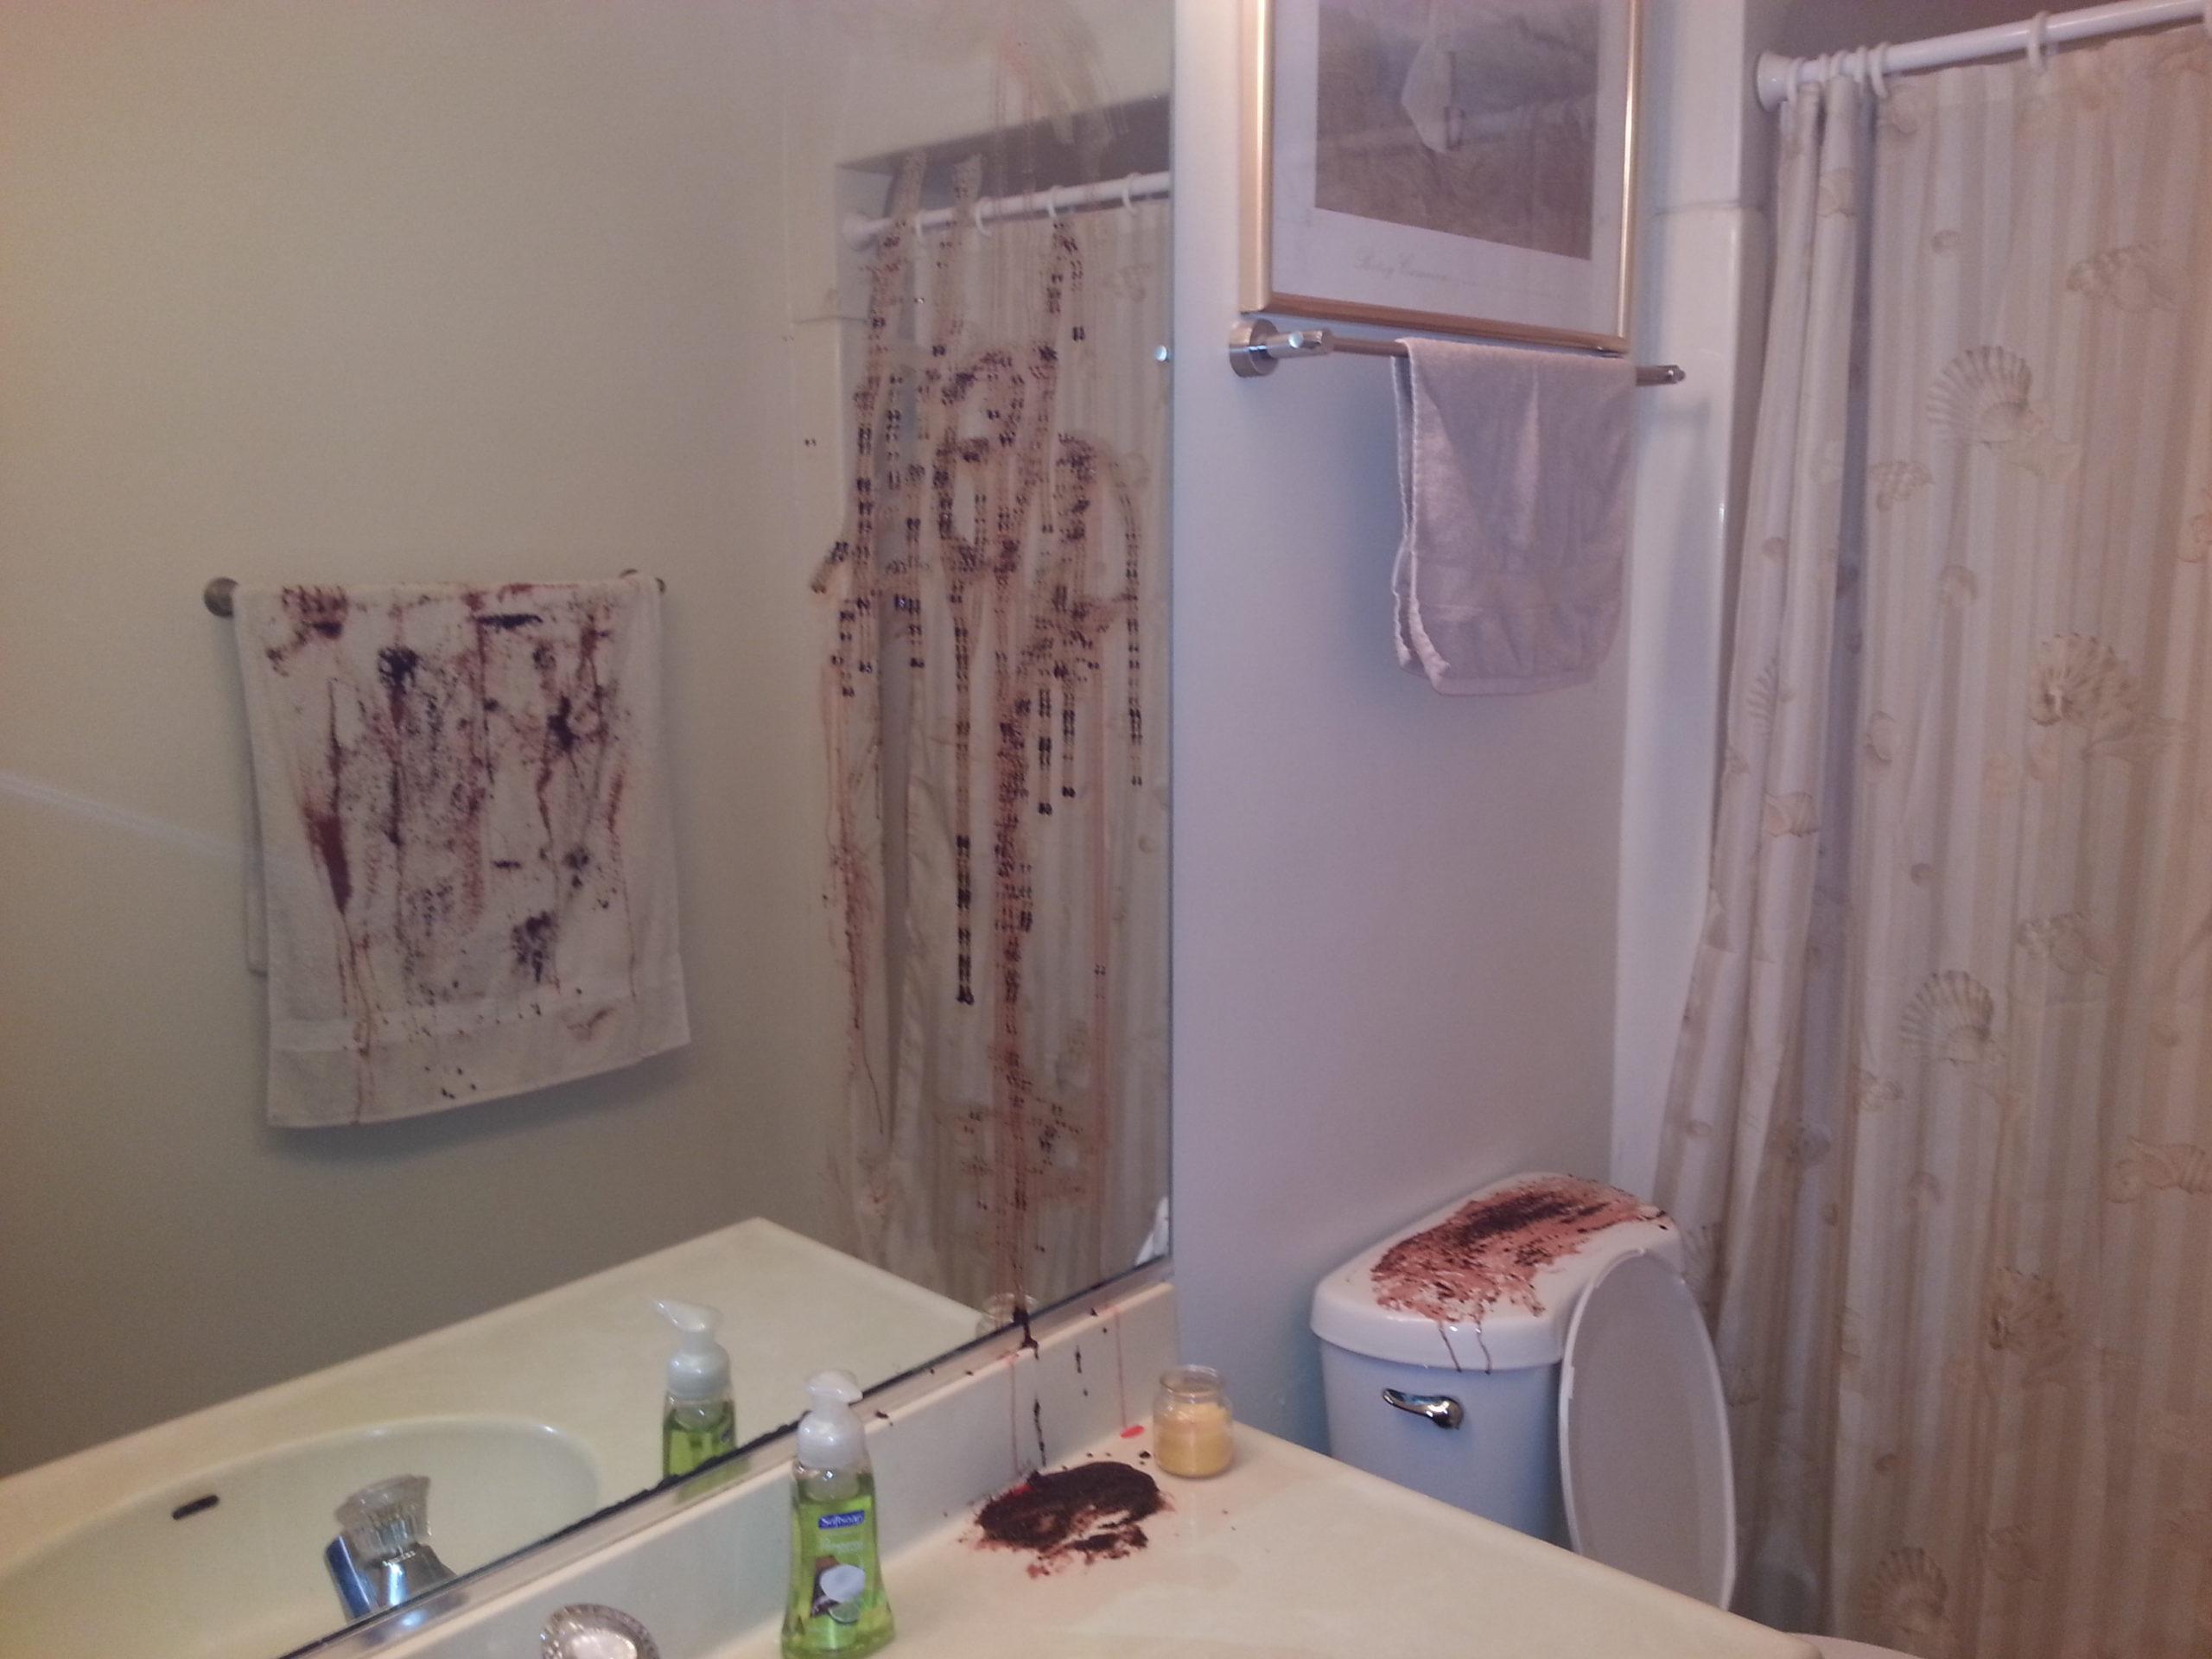 diy halloween bathroom decor or how chrissy is seriously